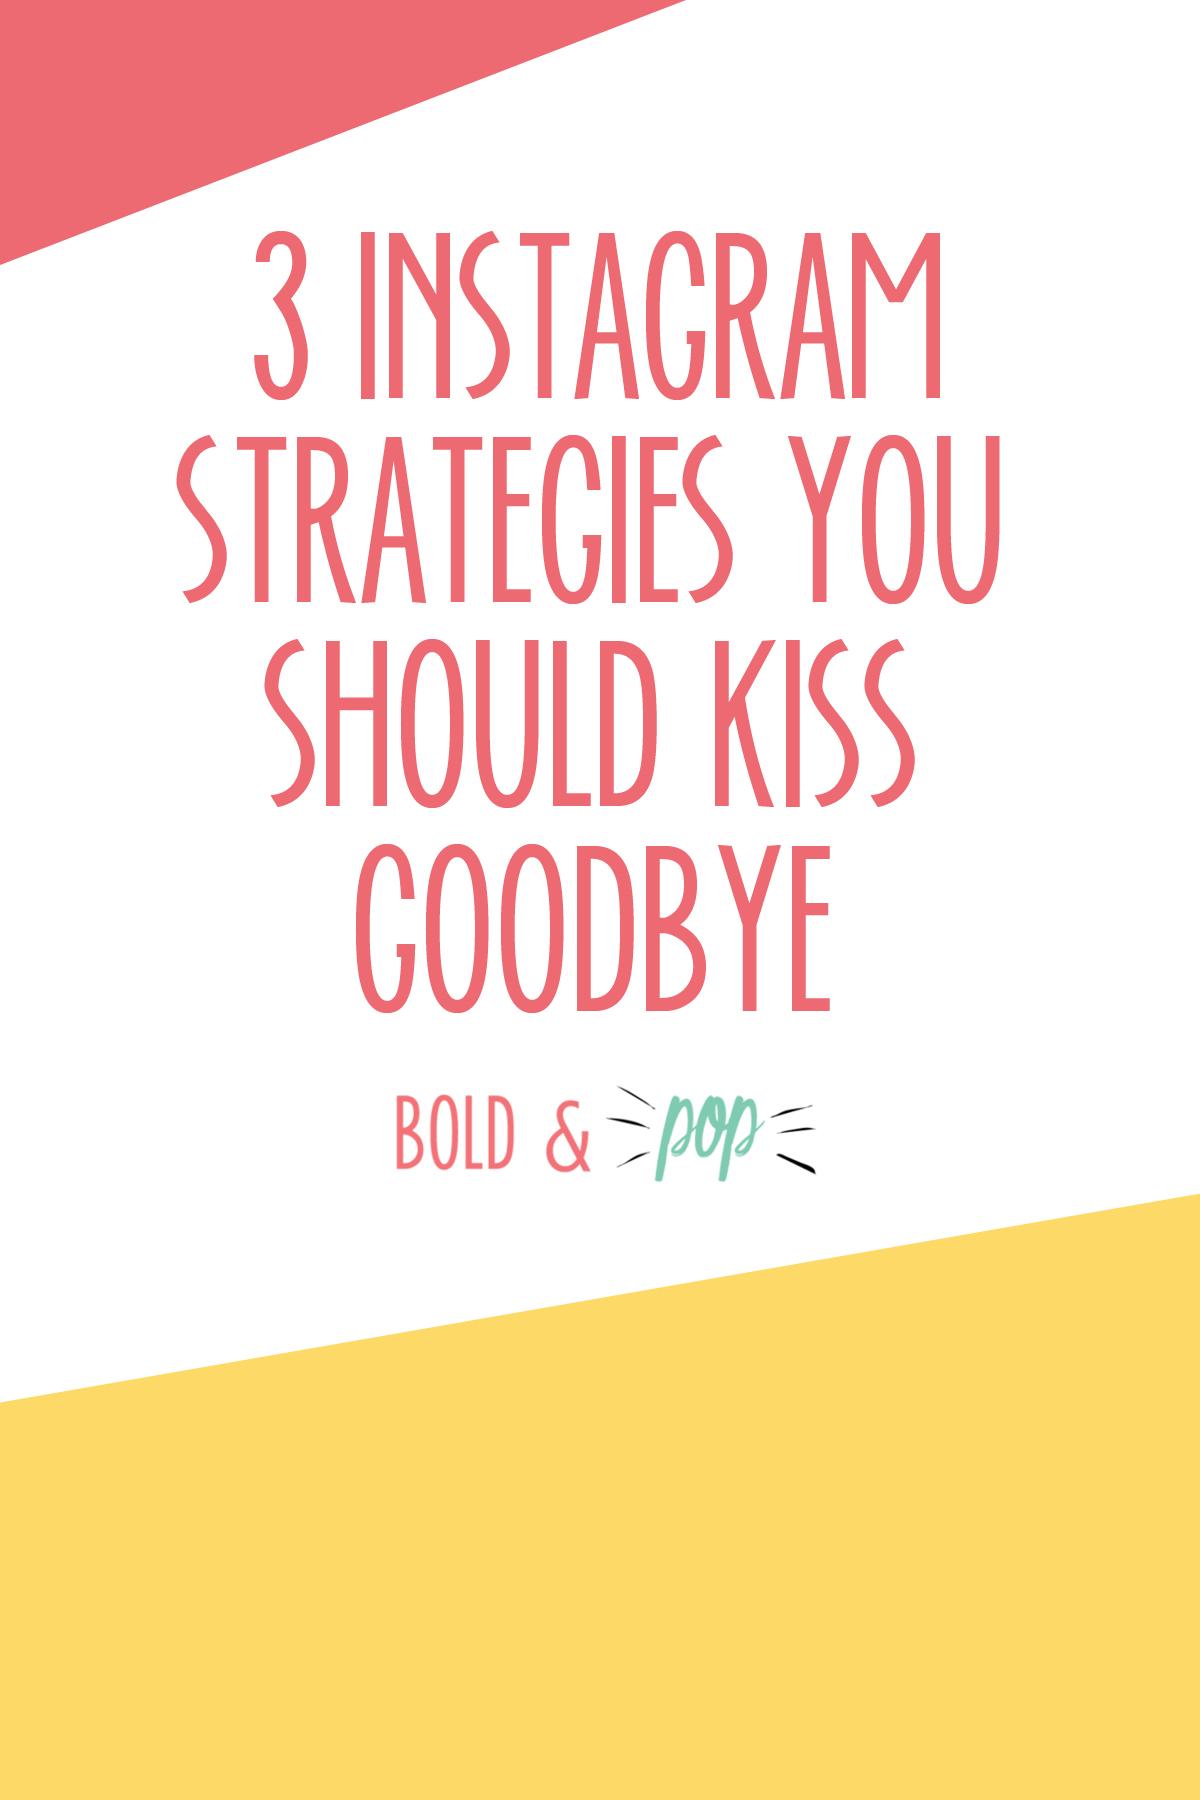 Bold & Pop : 3 Instagram Strategies You Should Kiss Goodbye